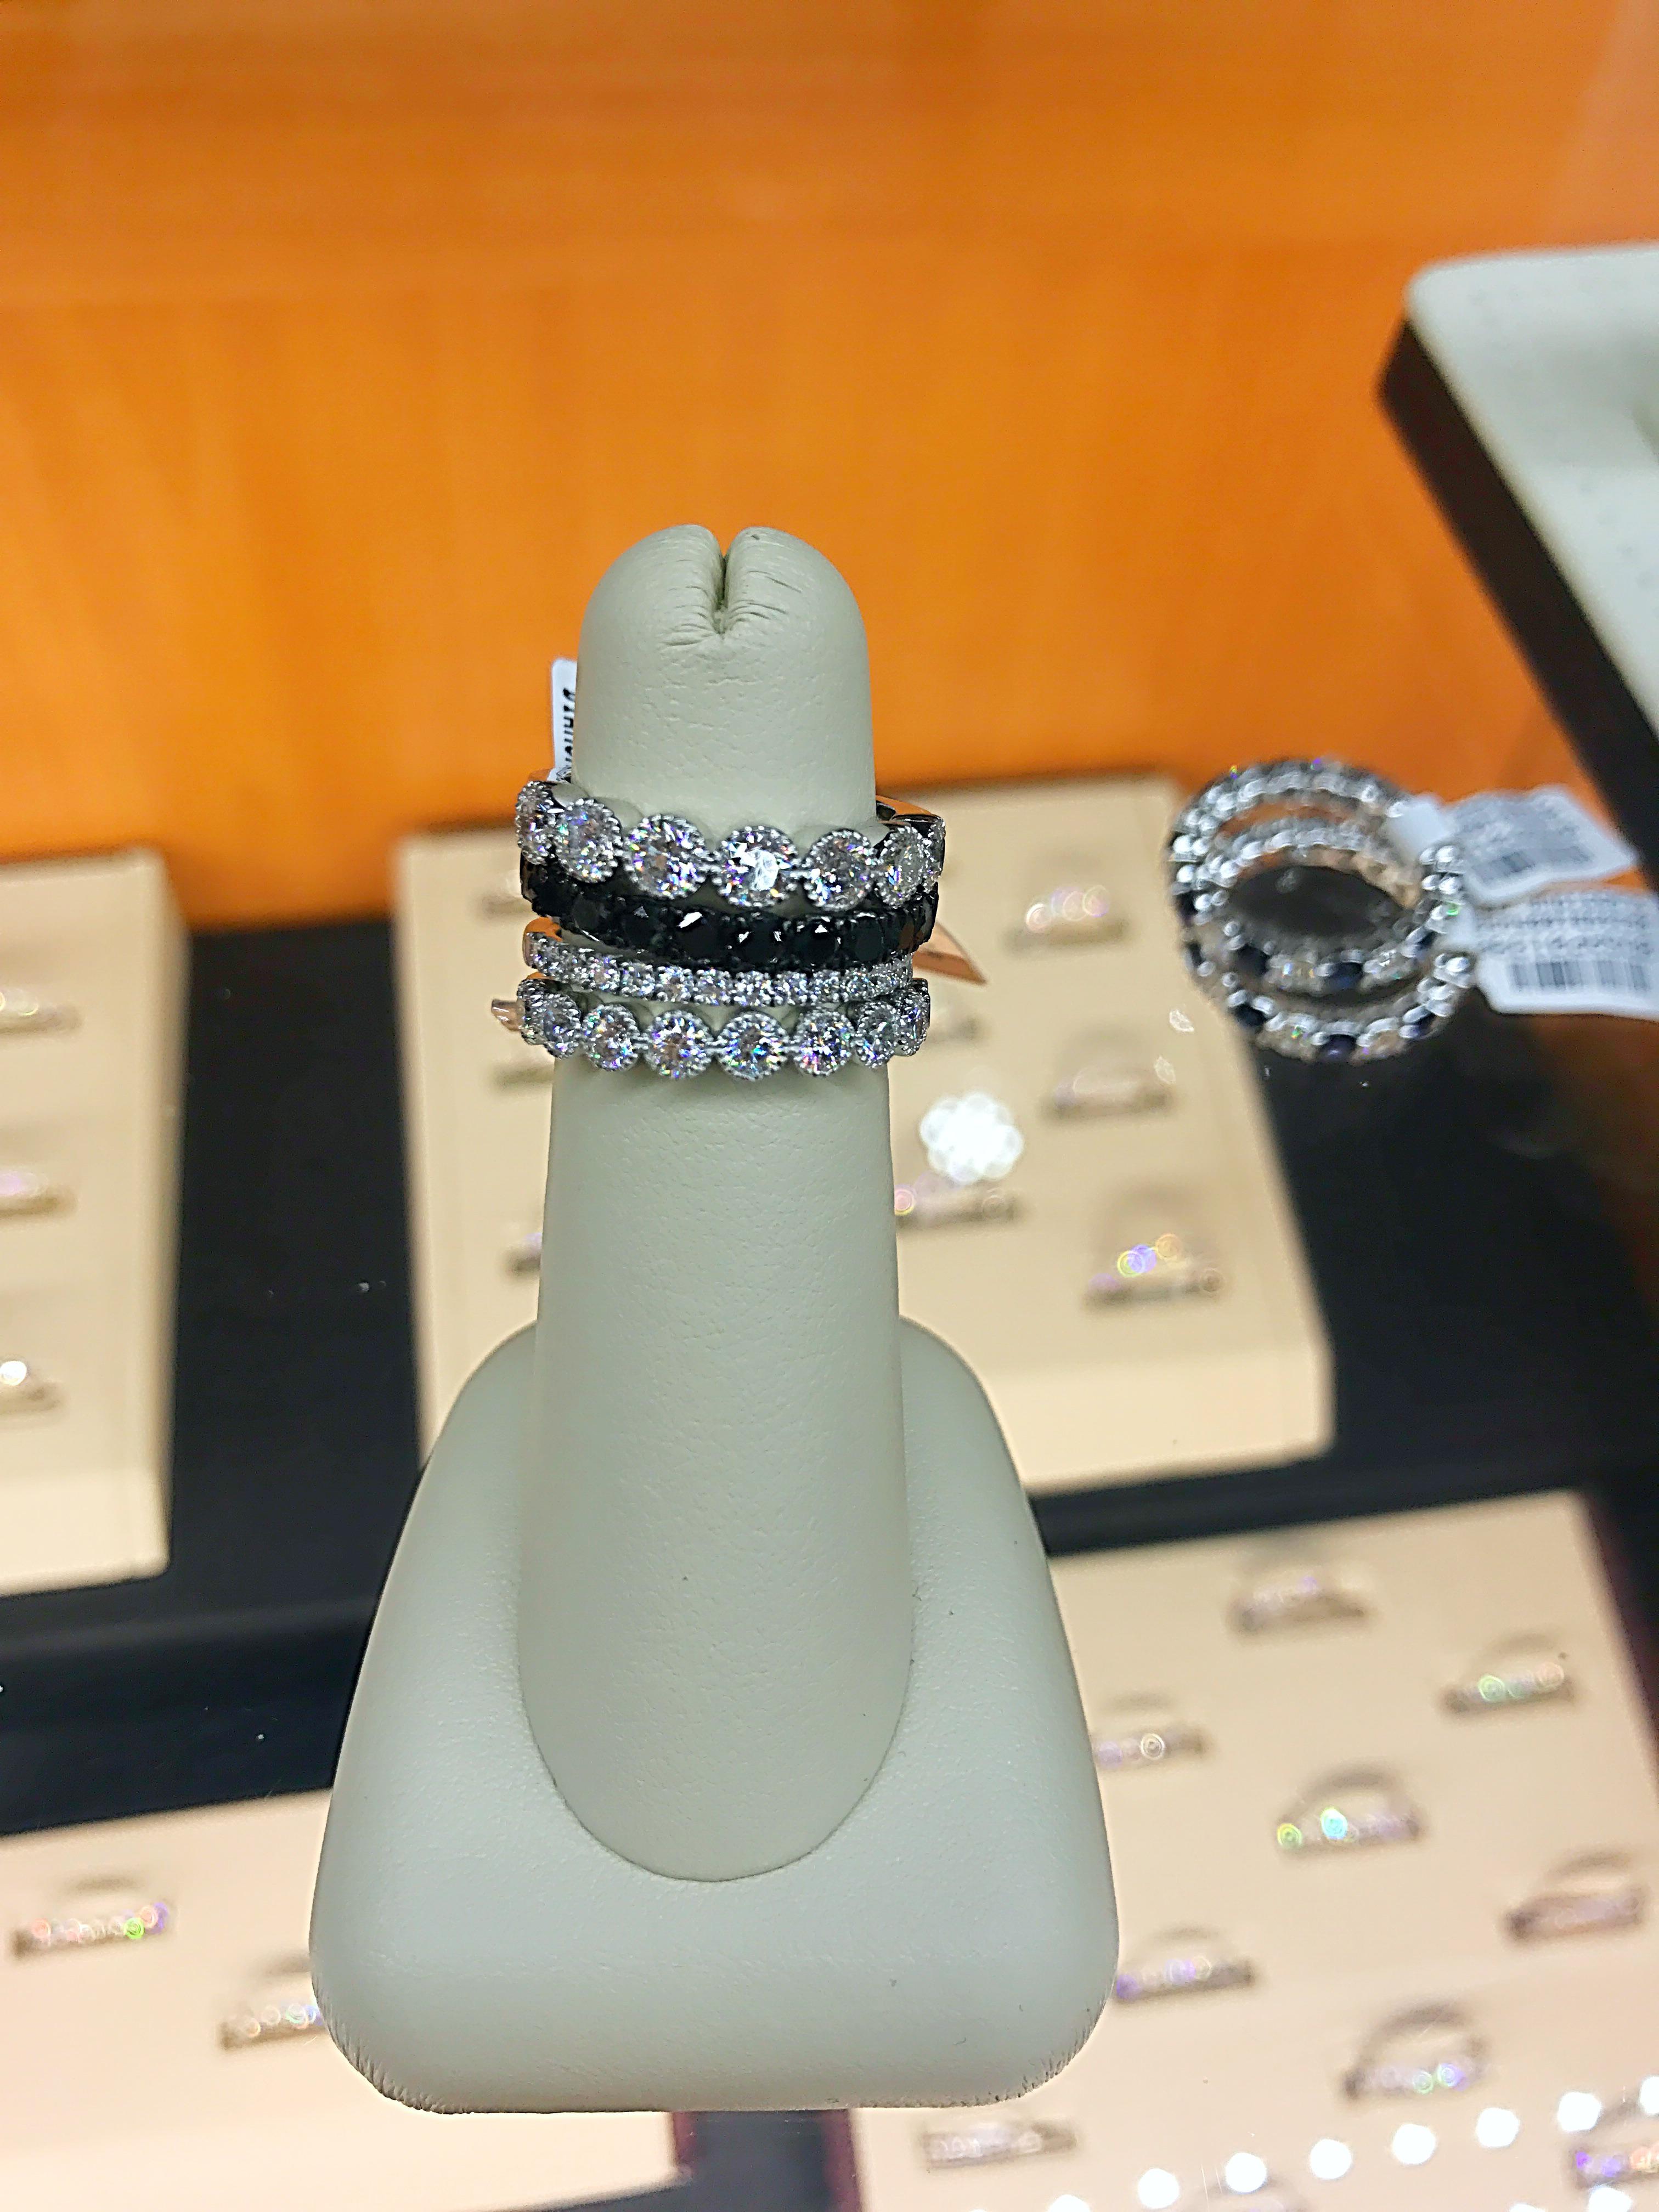 Diamonds Direct Summer Showcase - Summer Designer Showcase with Diamonds Direct featured by popular Texas fashion blogger, Style Your Senses